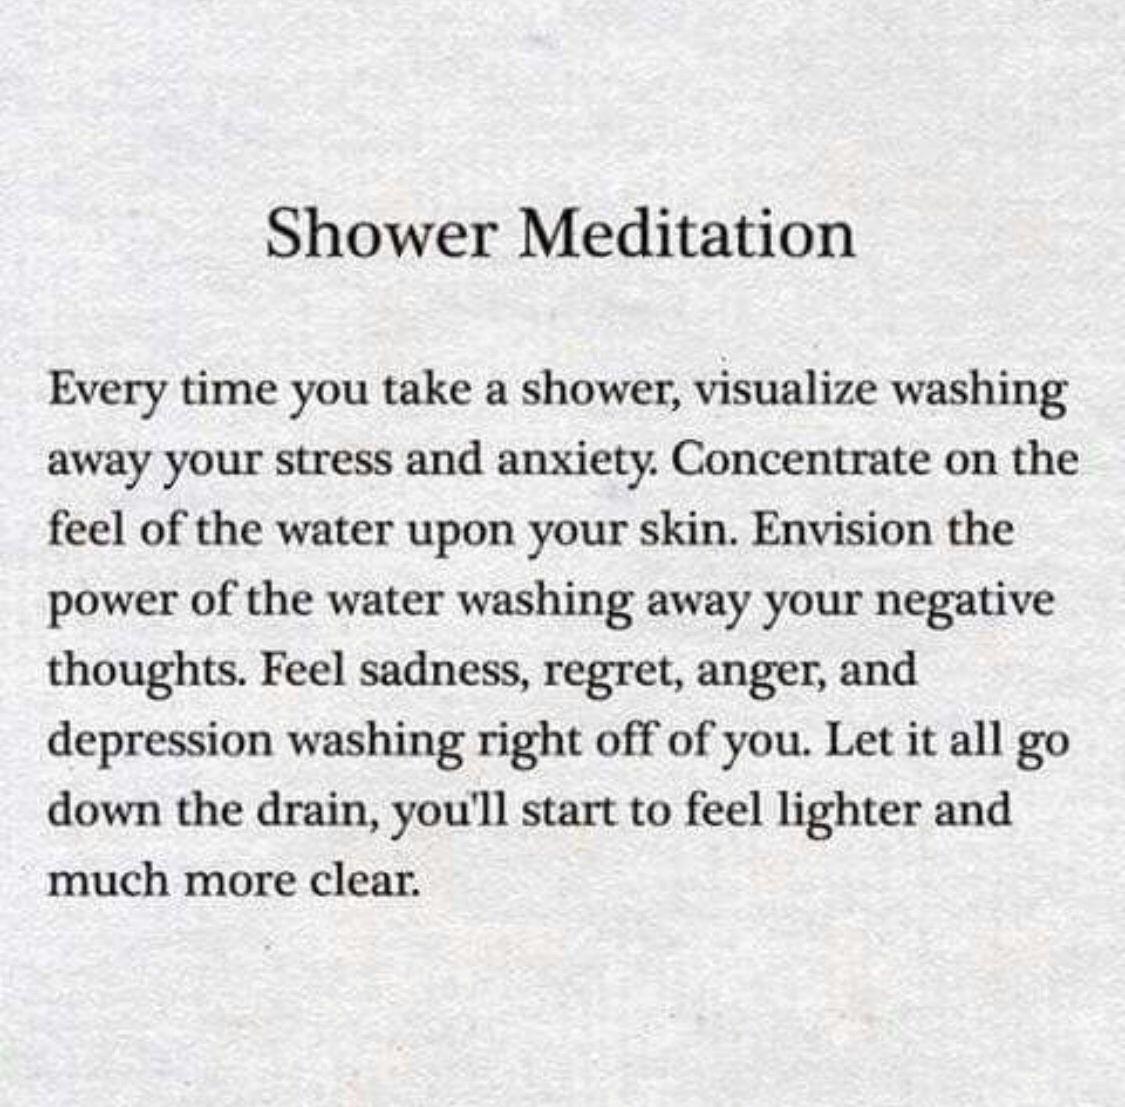 Shower Meditation